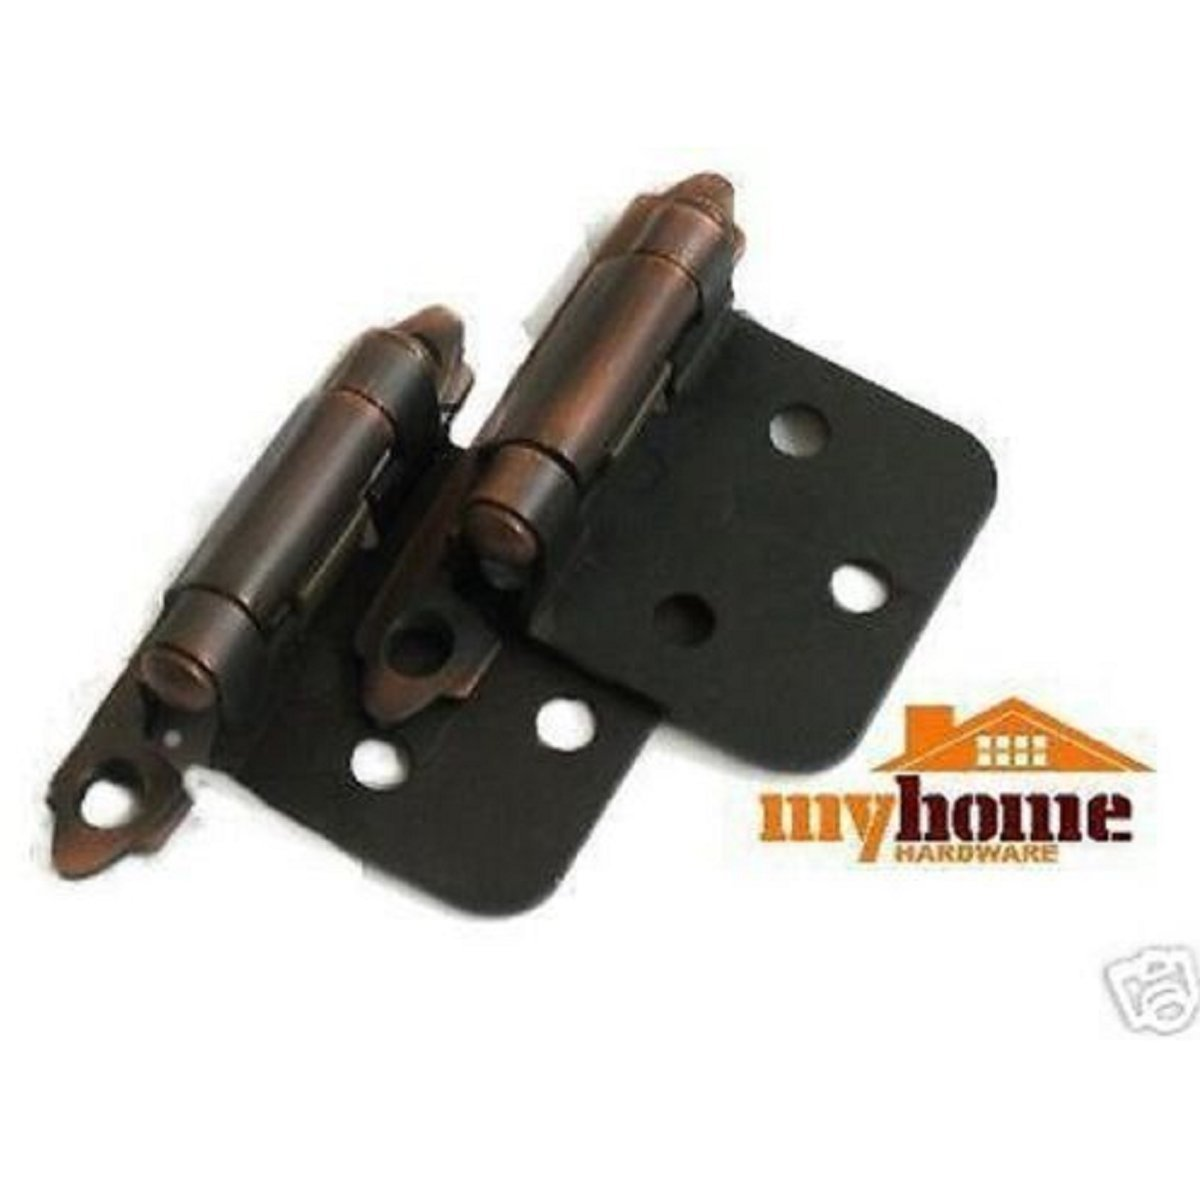 USA Premium Store Cabinet Door Flush Hinges Brushed Oil Rubbed Bronze Hinge 25 pair (50 pieces)